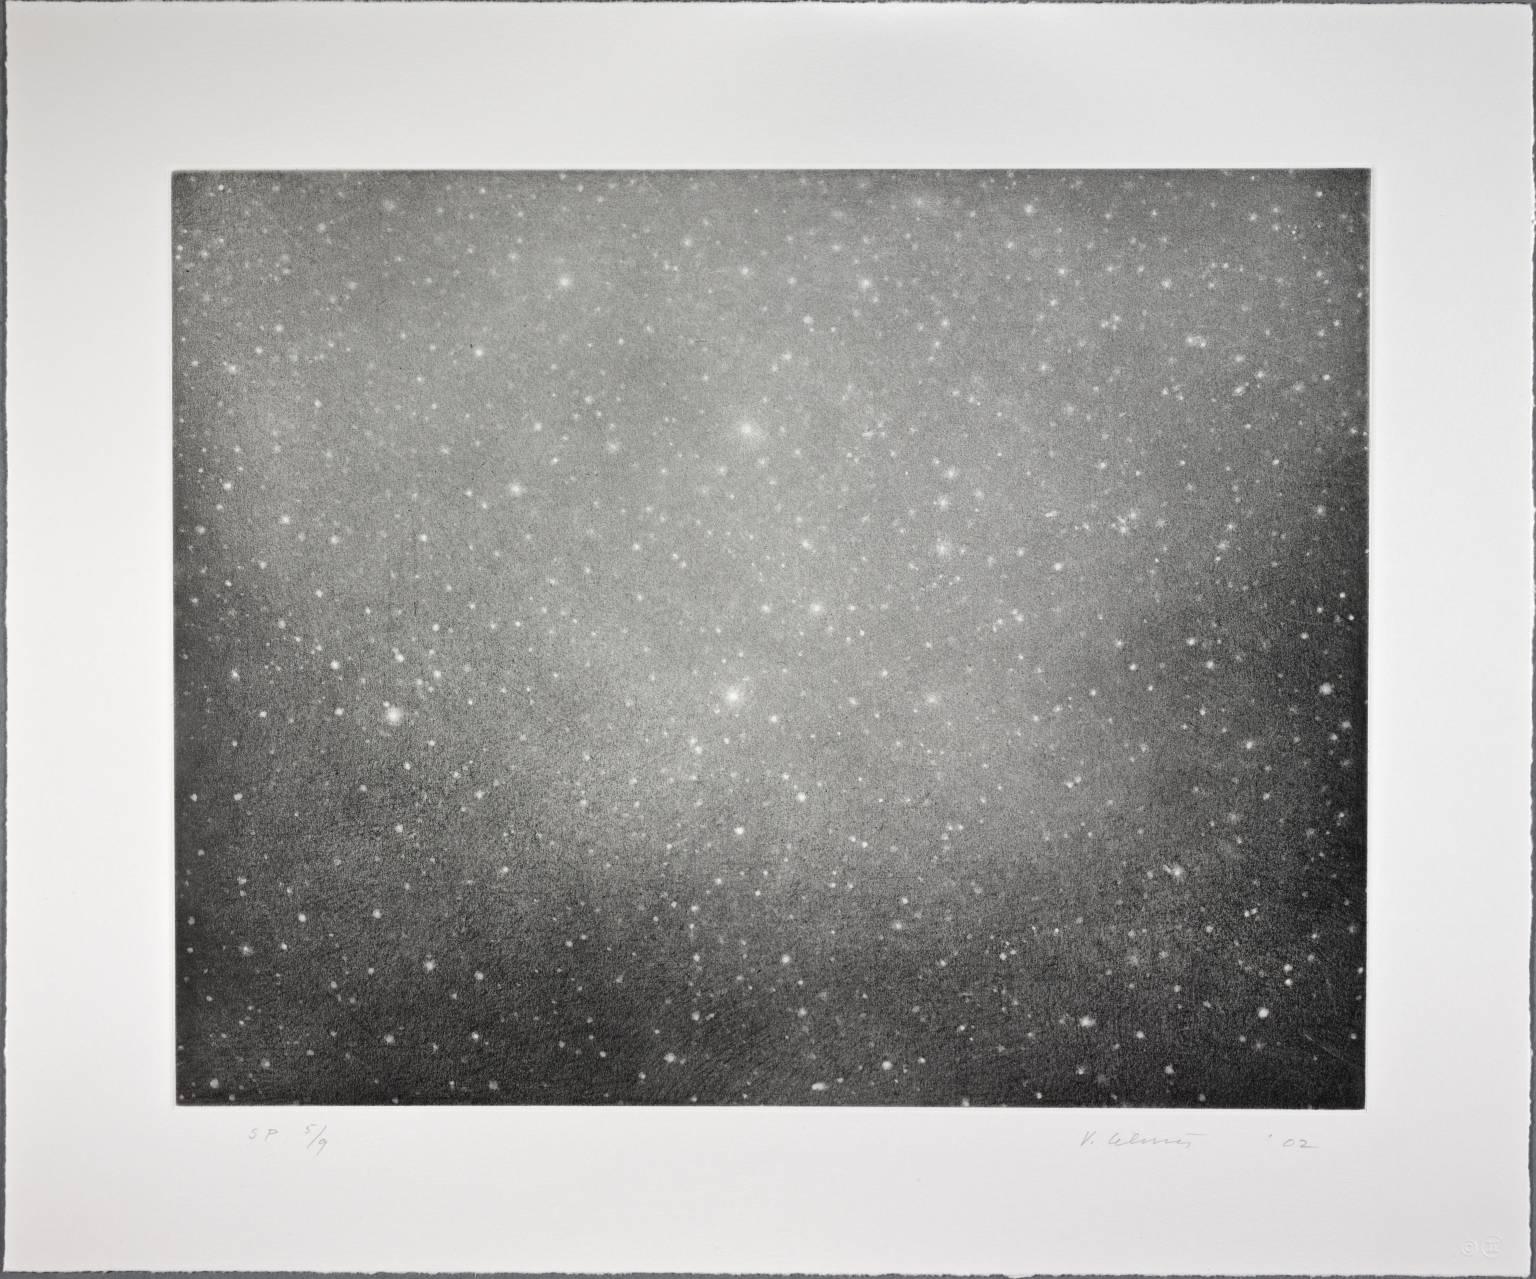 Night Sky 3 2002 by Vija Celmins born 1938